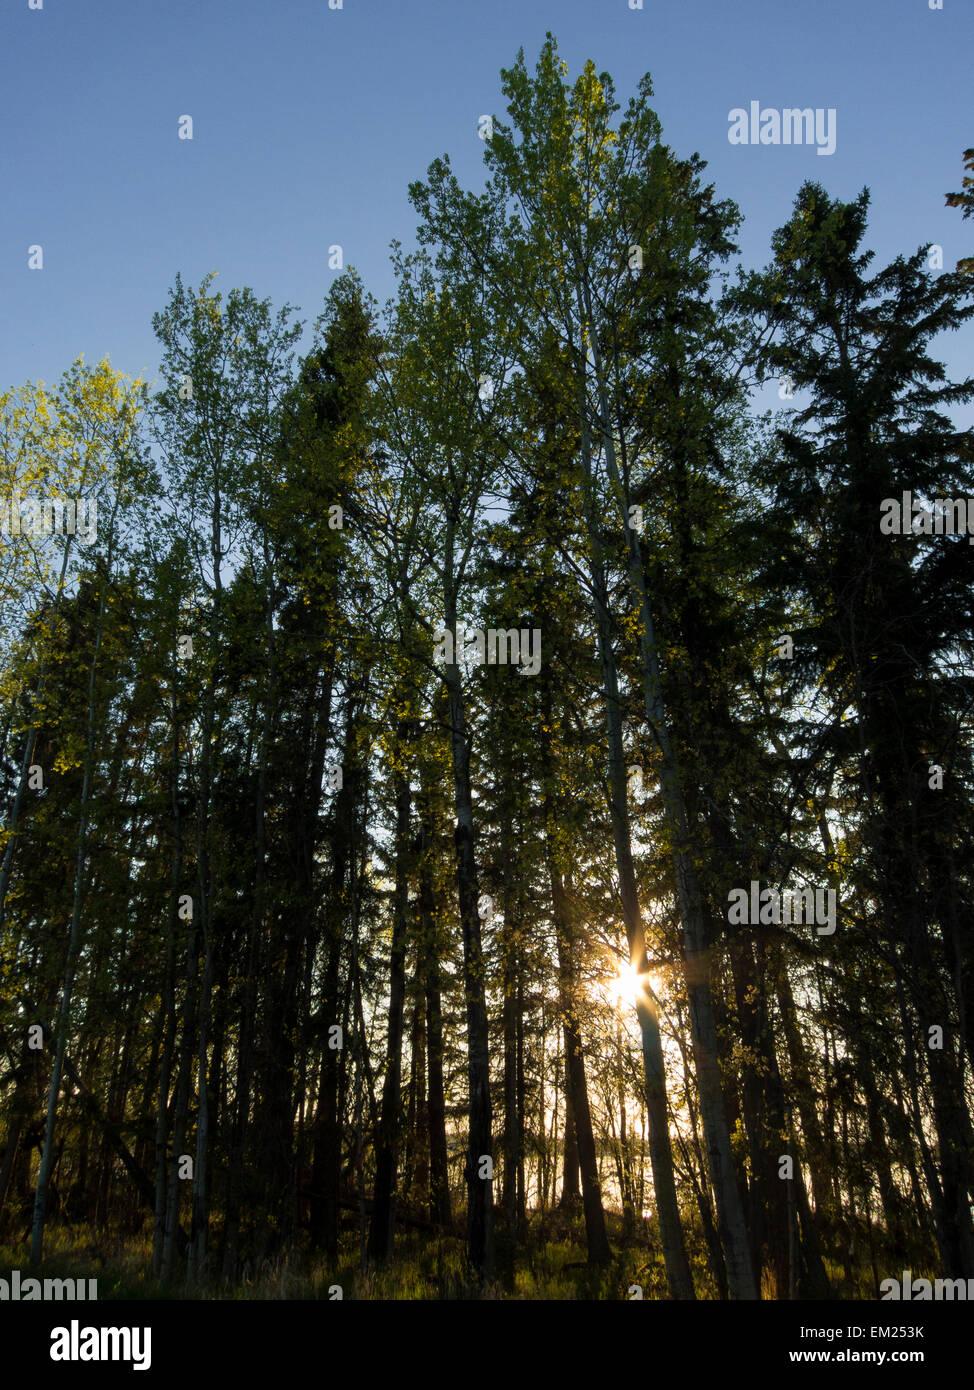 Boreal forest lines Dore Lake North of Saskatoon, Saskatchewan, Canada. - Stock Image